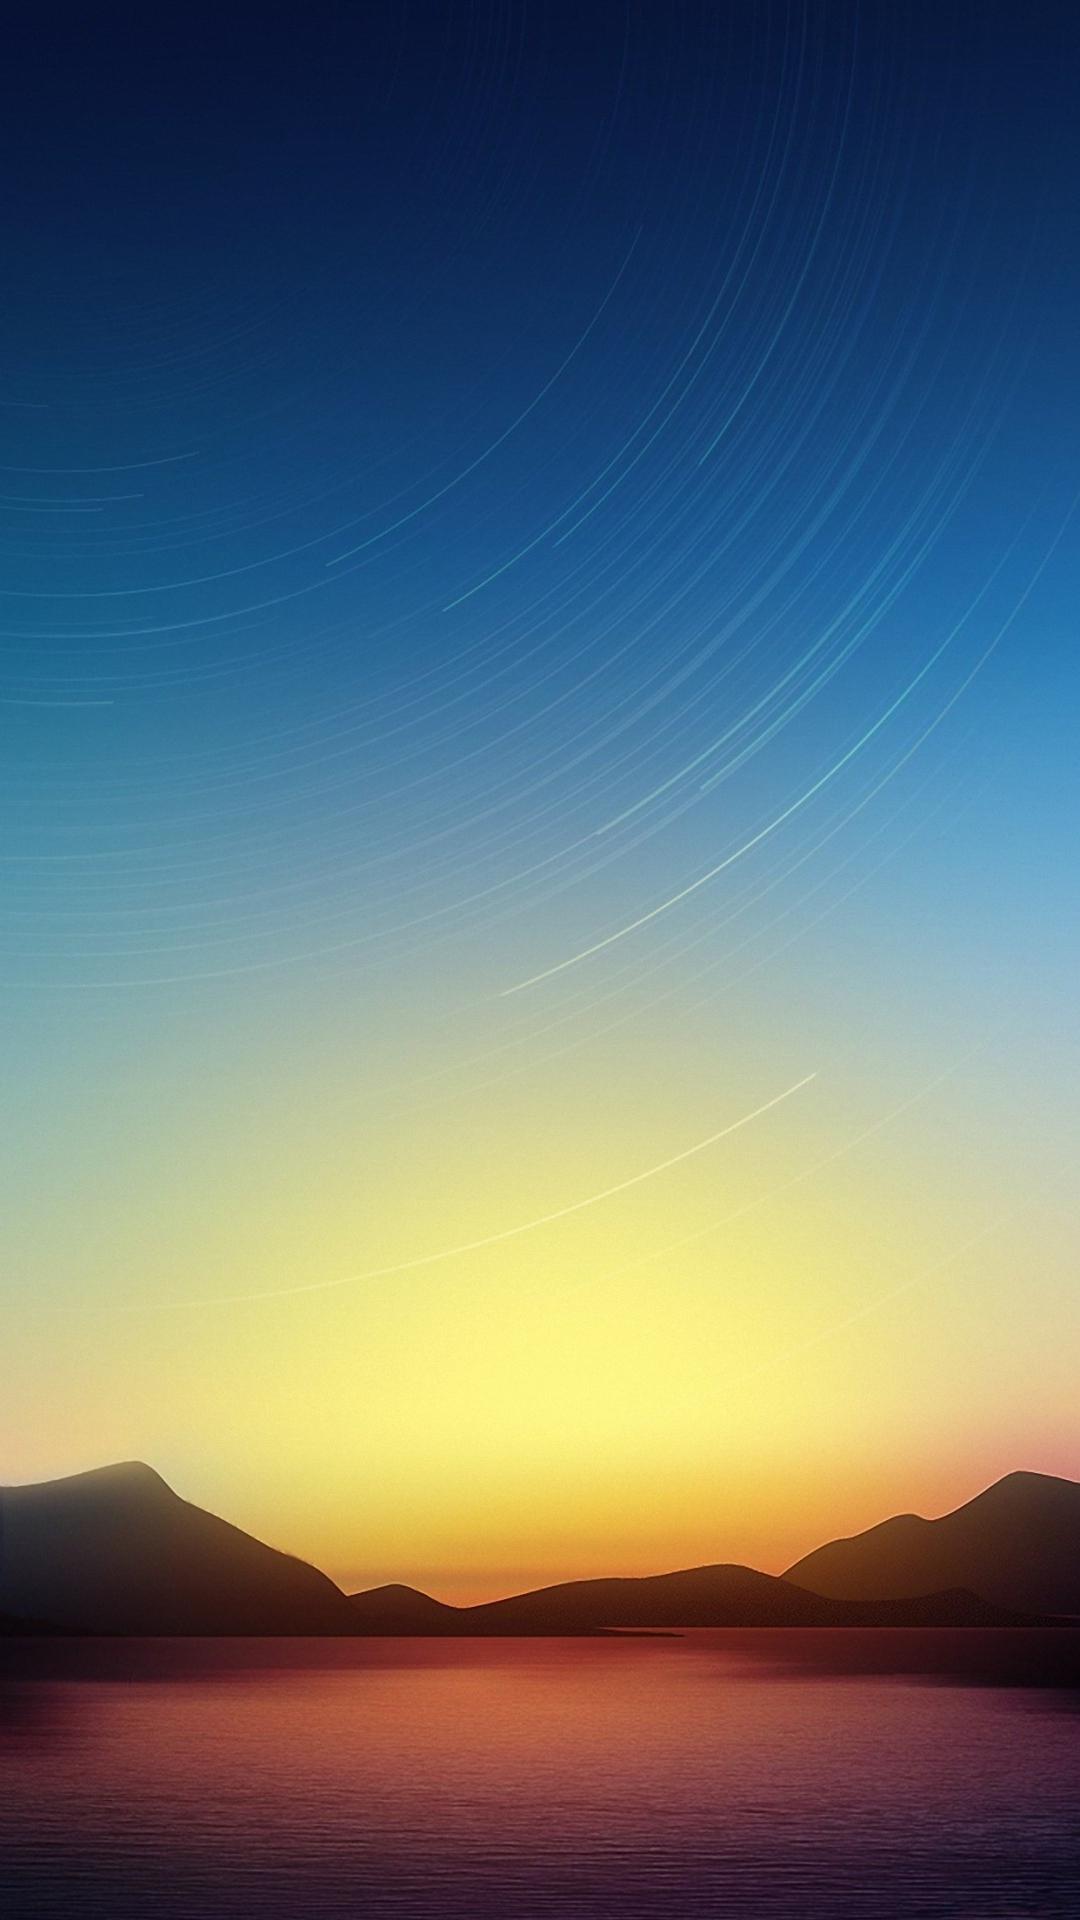 1080x1920 Dusk Sky Sea iphone 6s plus Wallpaper HD 1080x1920